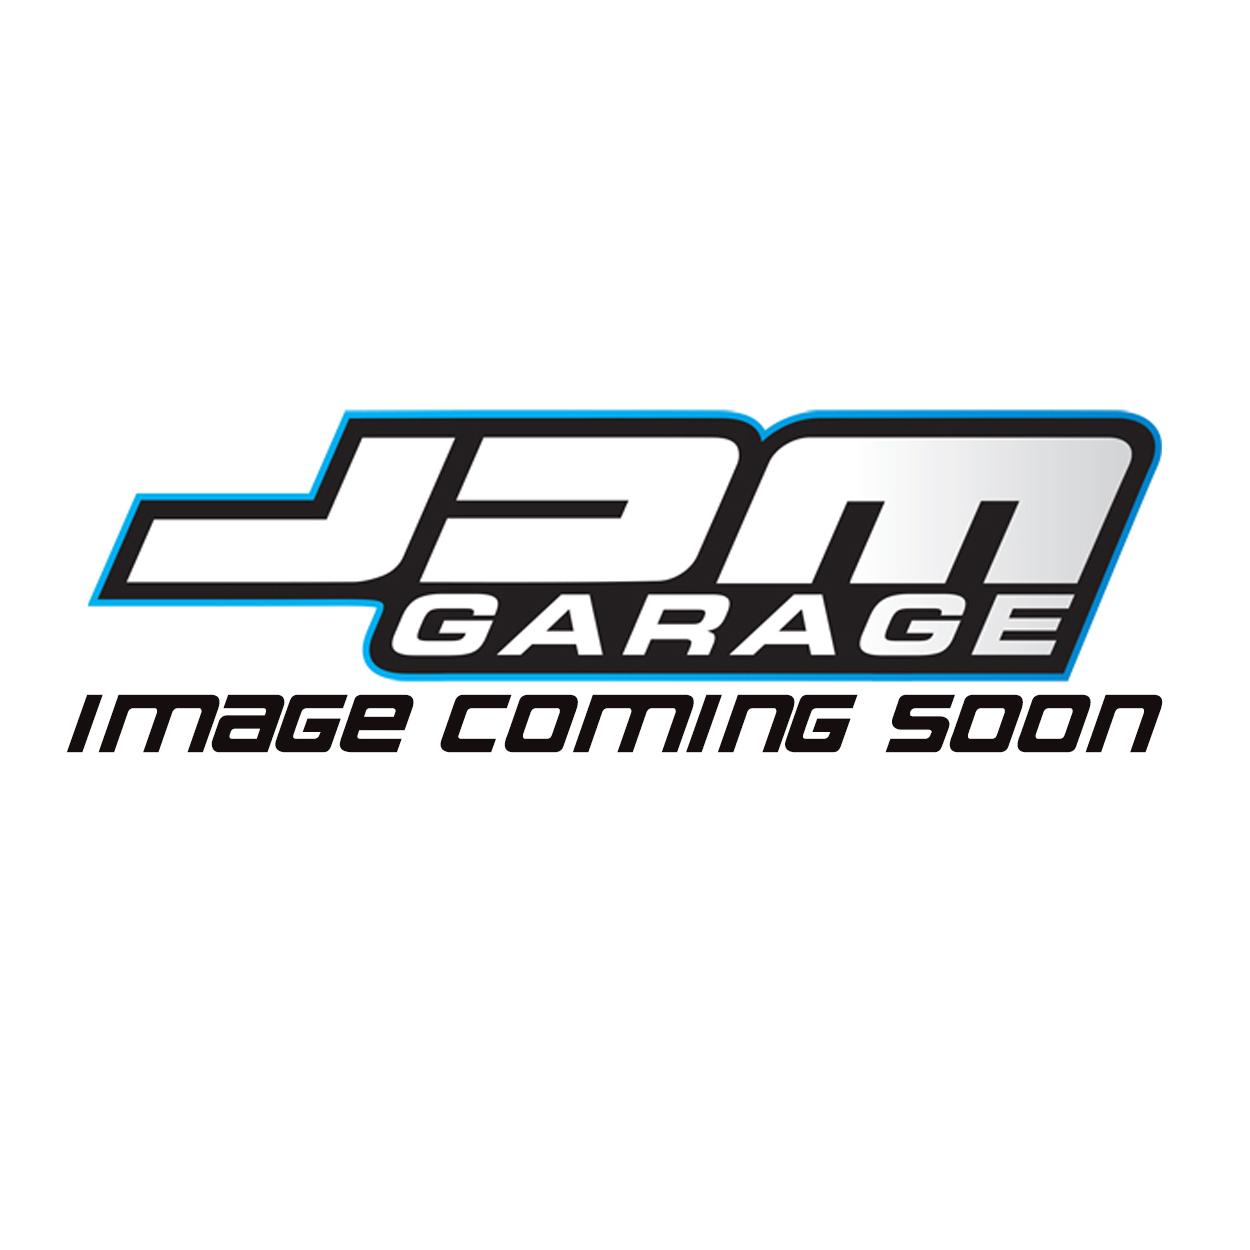 JDMGarageUK AN4 to M12 x 1.25 Adaptor Fitting